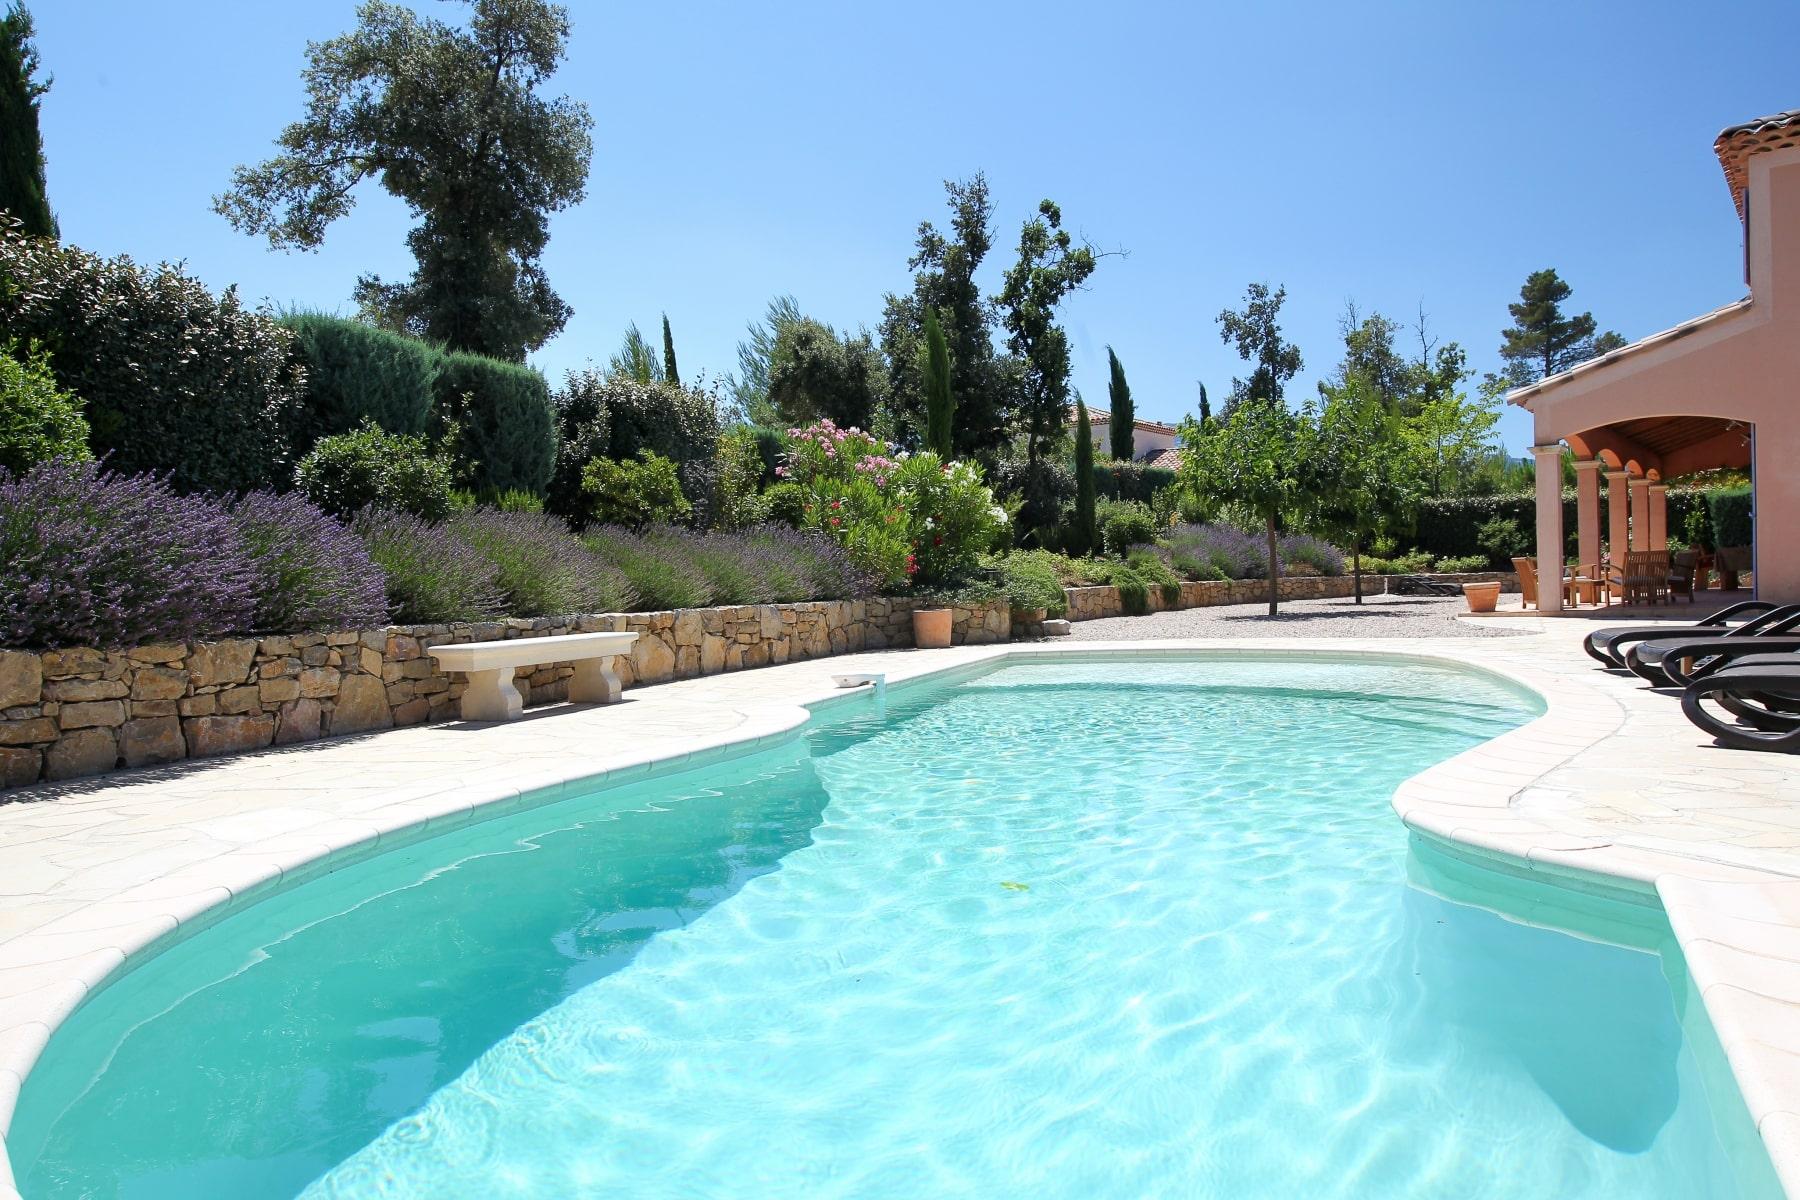 Vakantiehuis met privé zwembad Vallée de la St. Baume